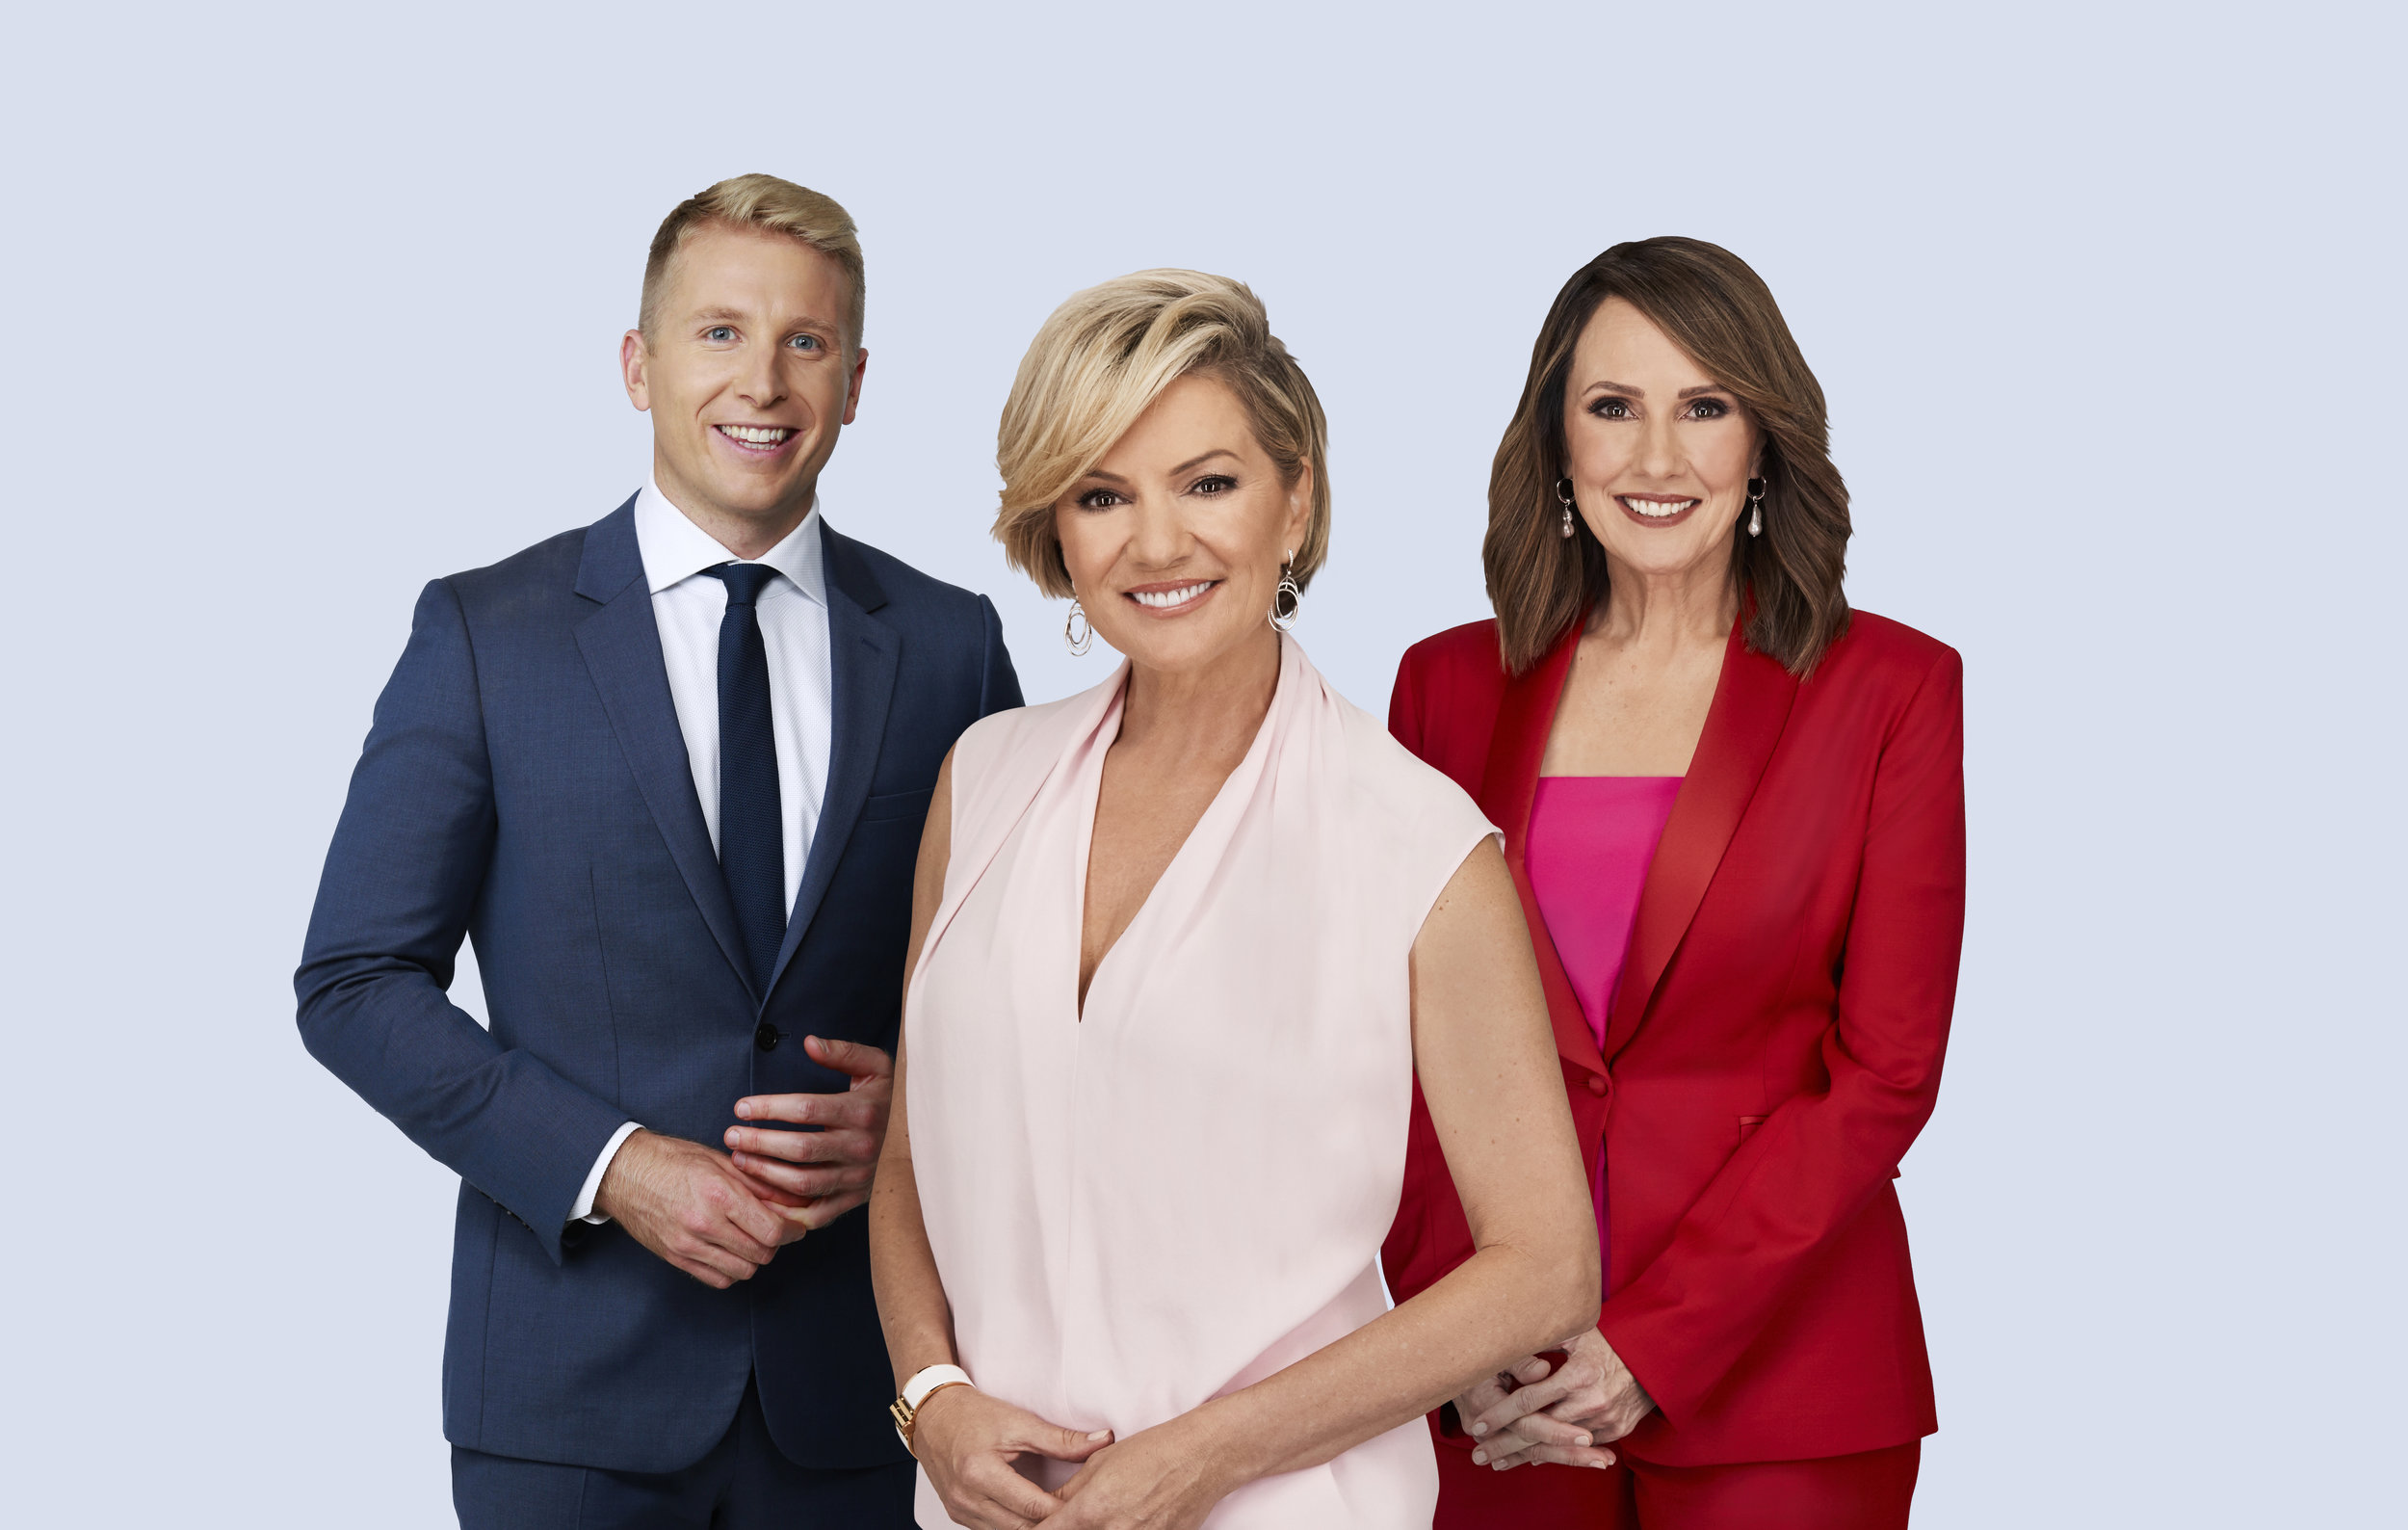 Hamish Macdonald, Sandra Sully, and Chris Bath  image - 10